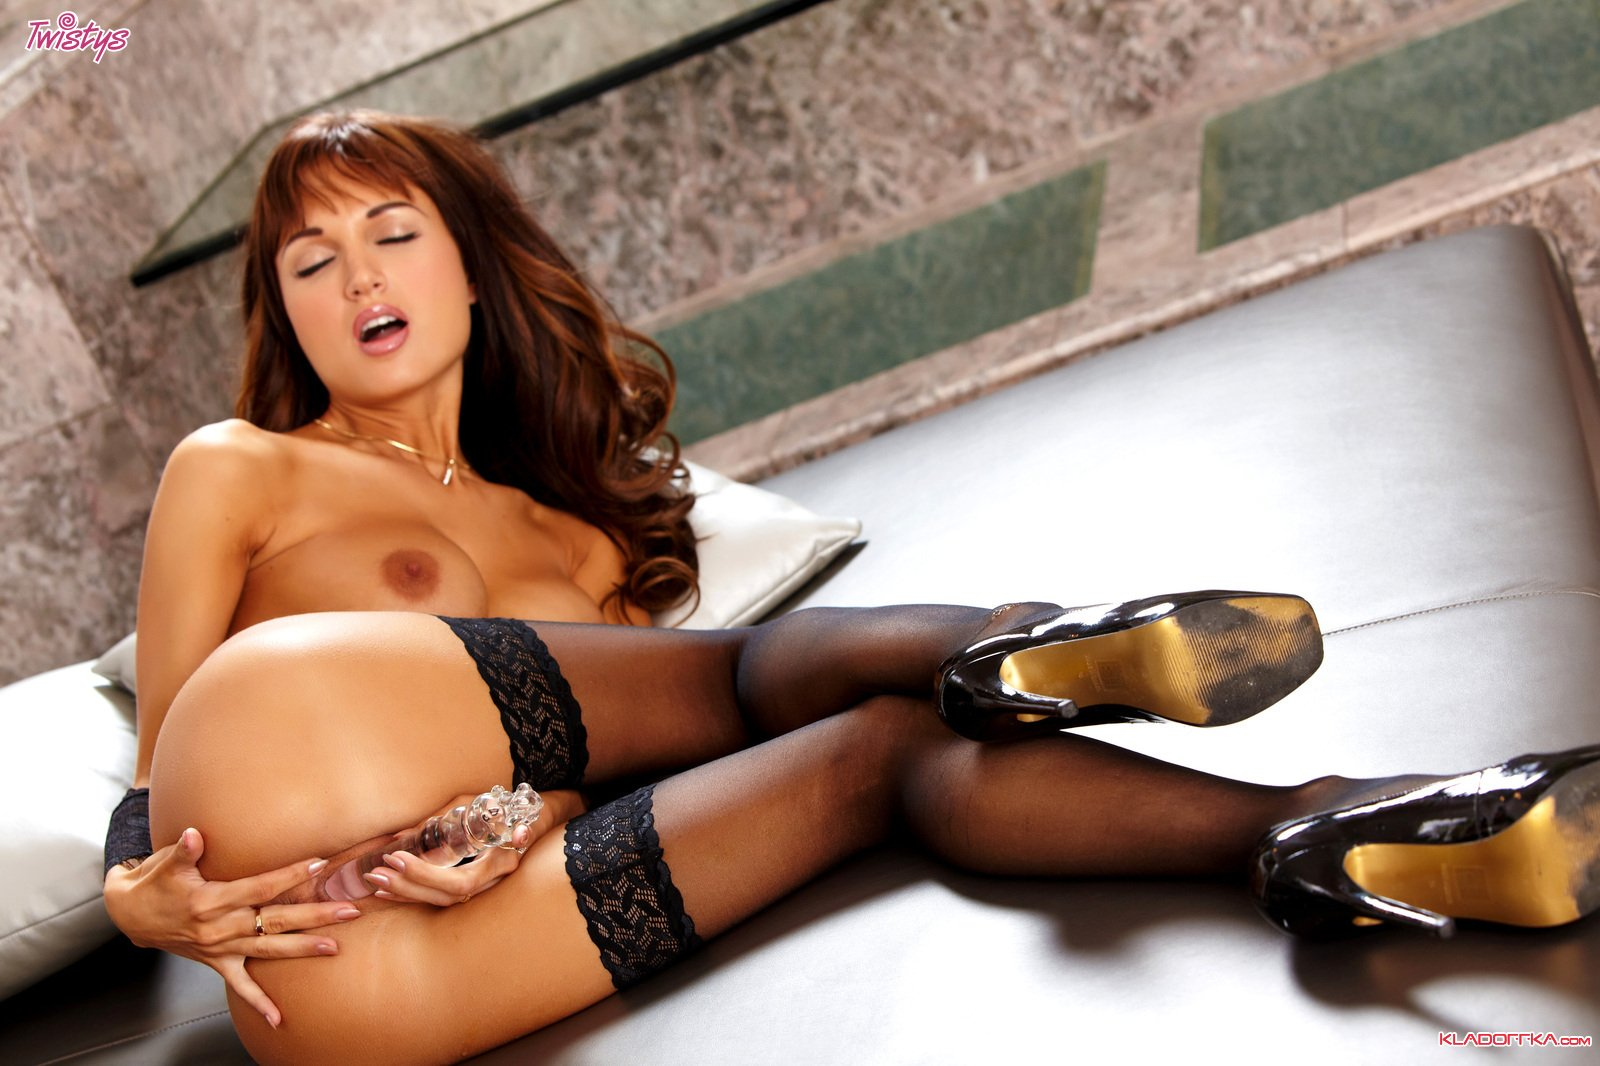 Roxanne порно актриса